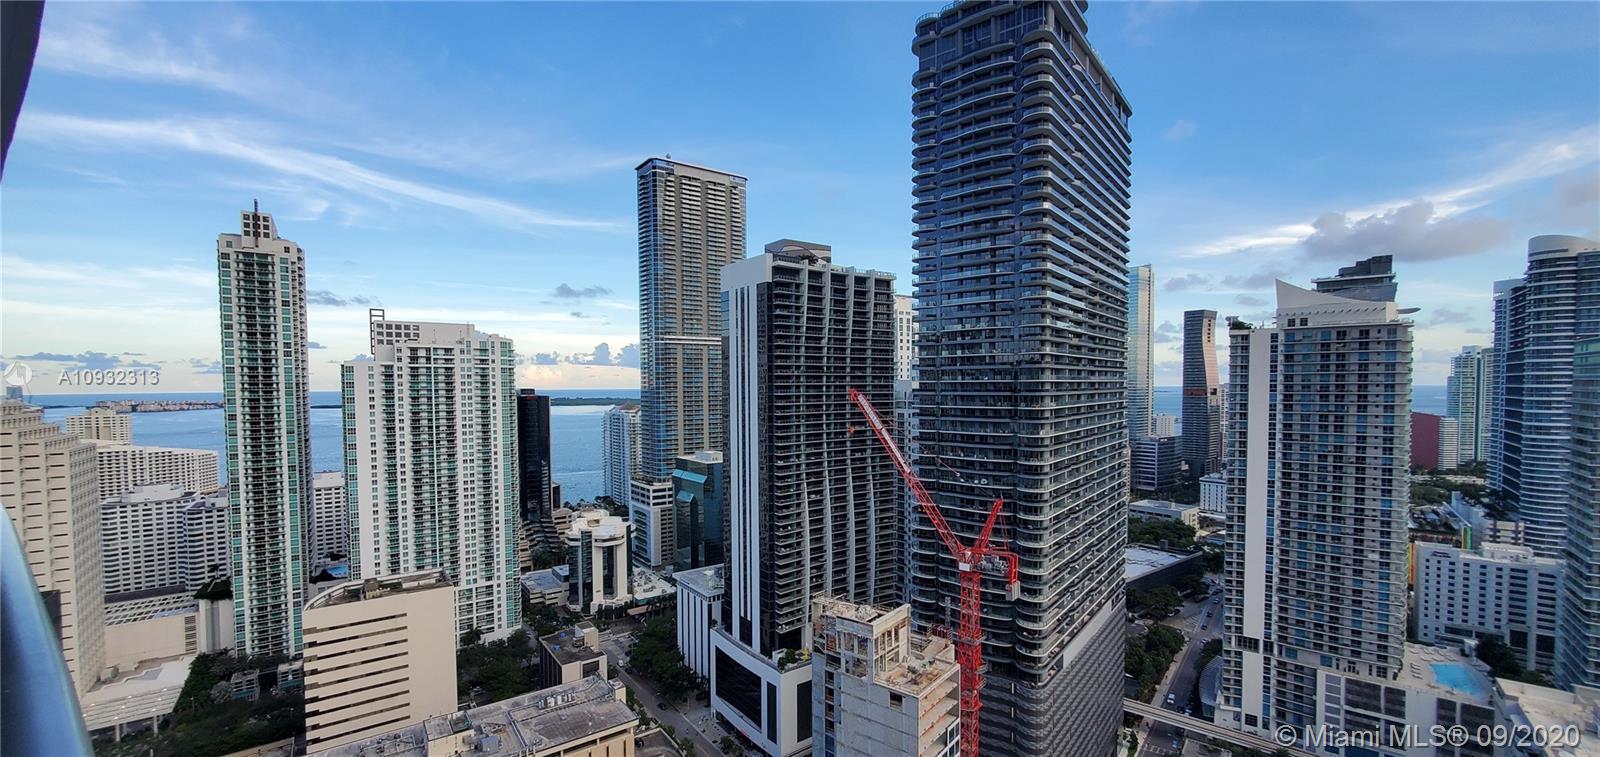 Miami, Cays